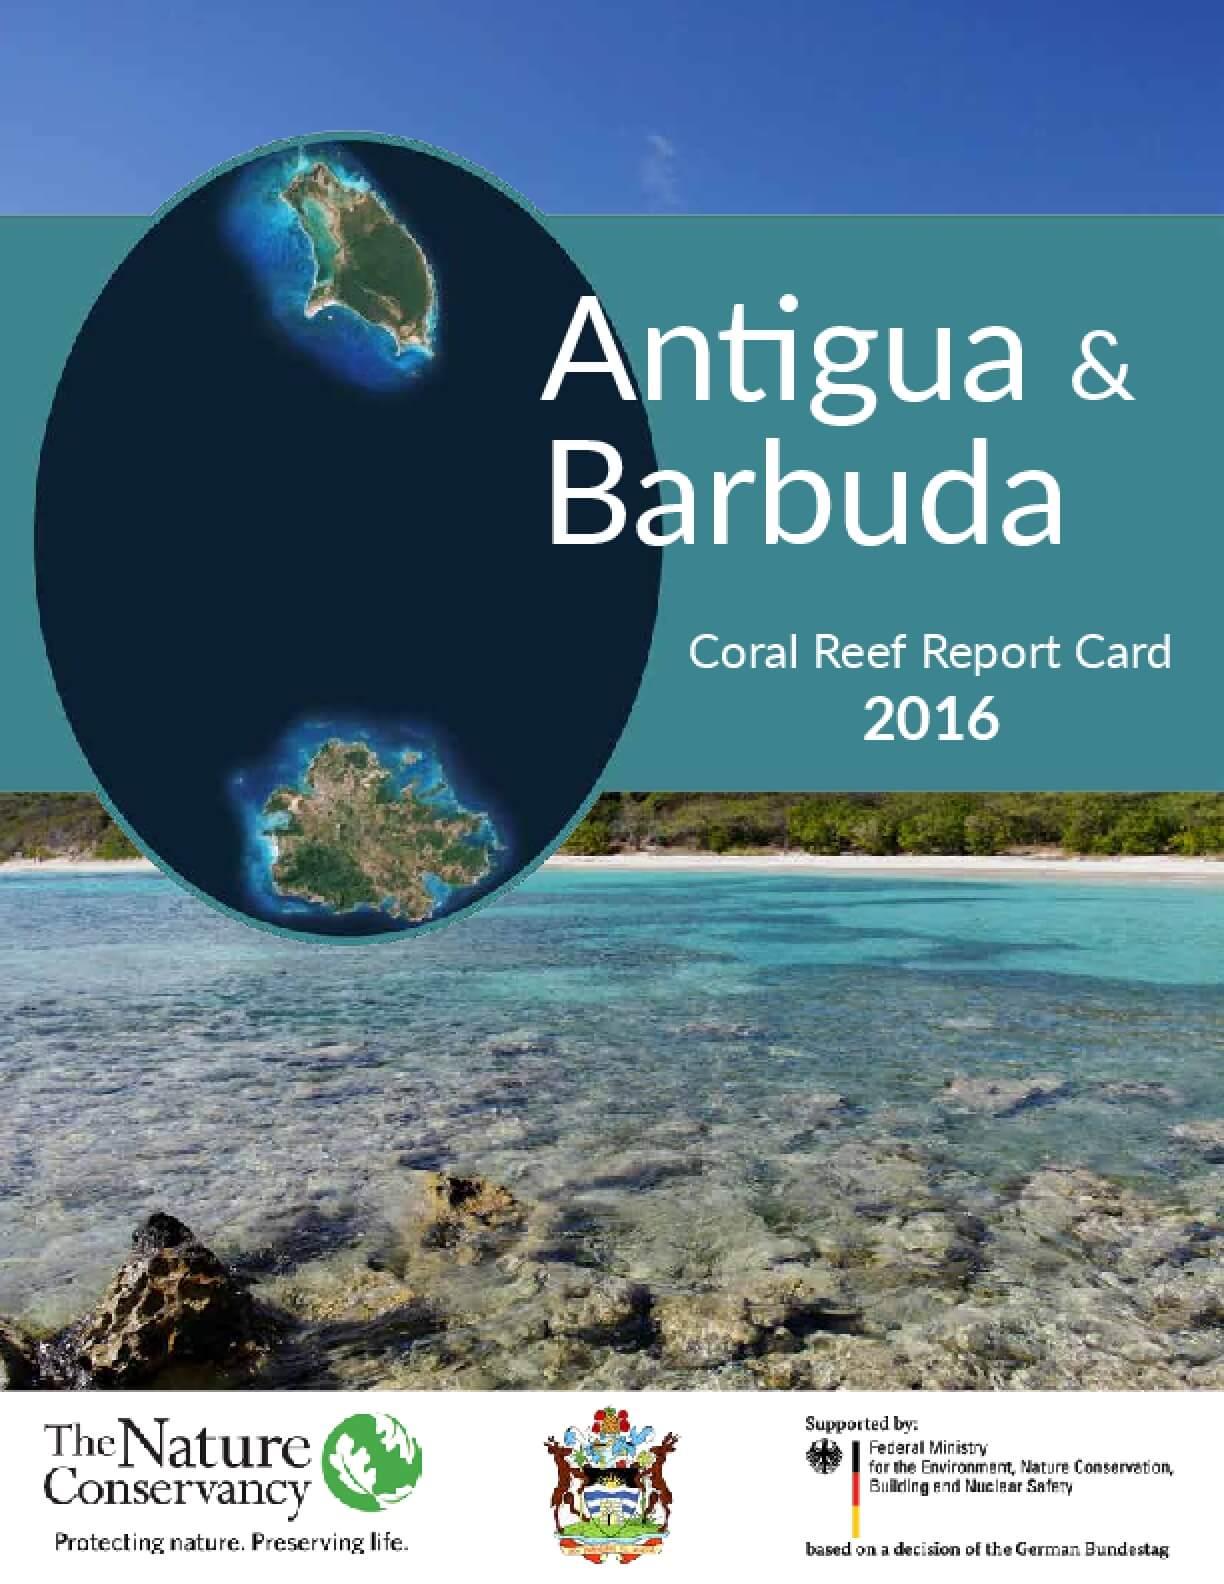 Antigua & Barbuda: Coral Reef Report Card 2016